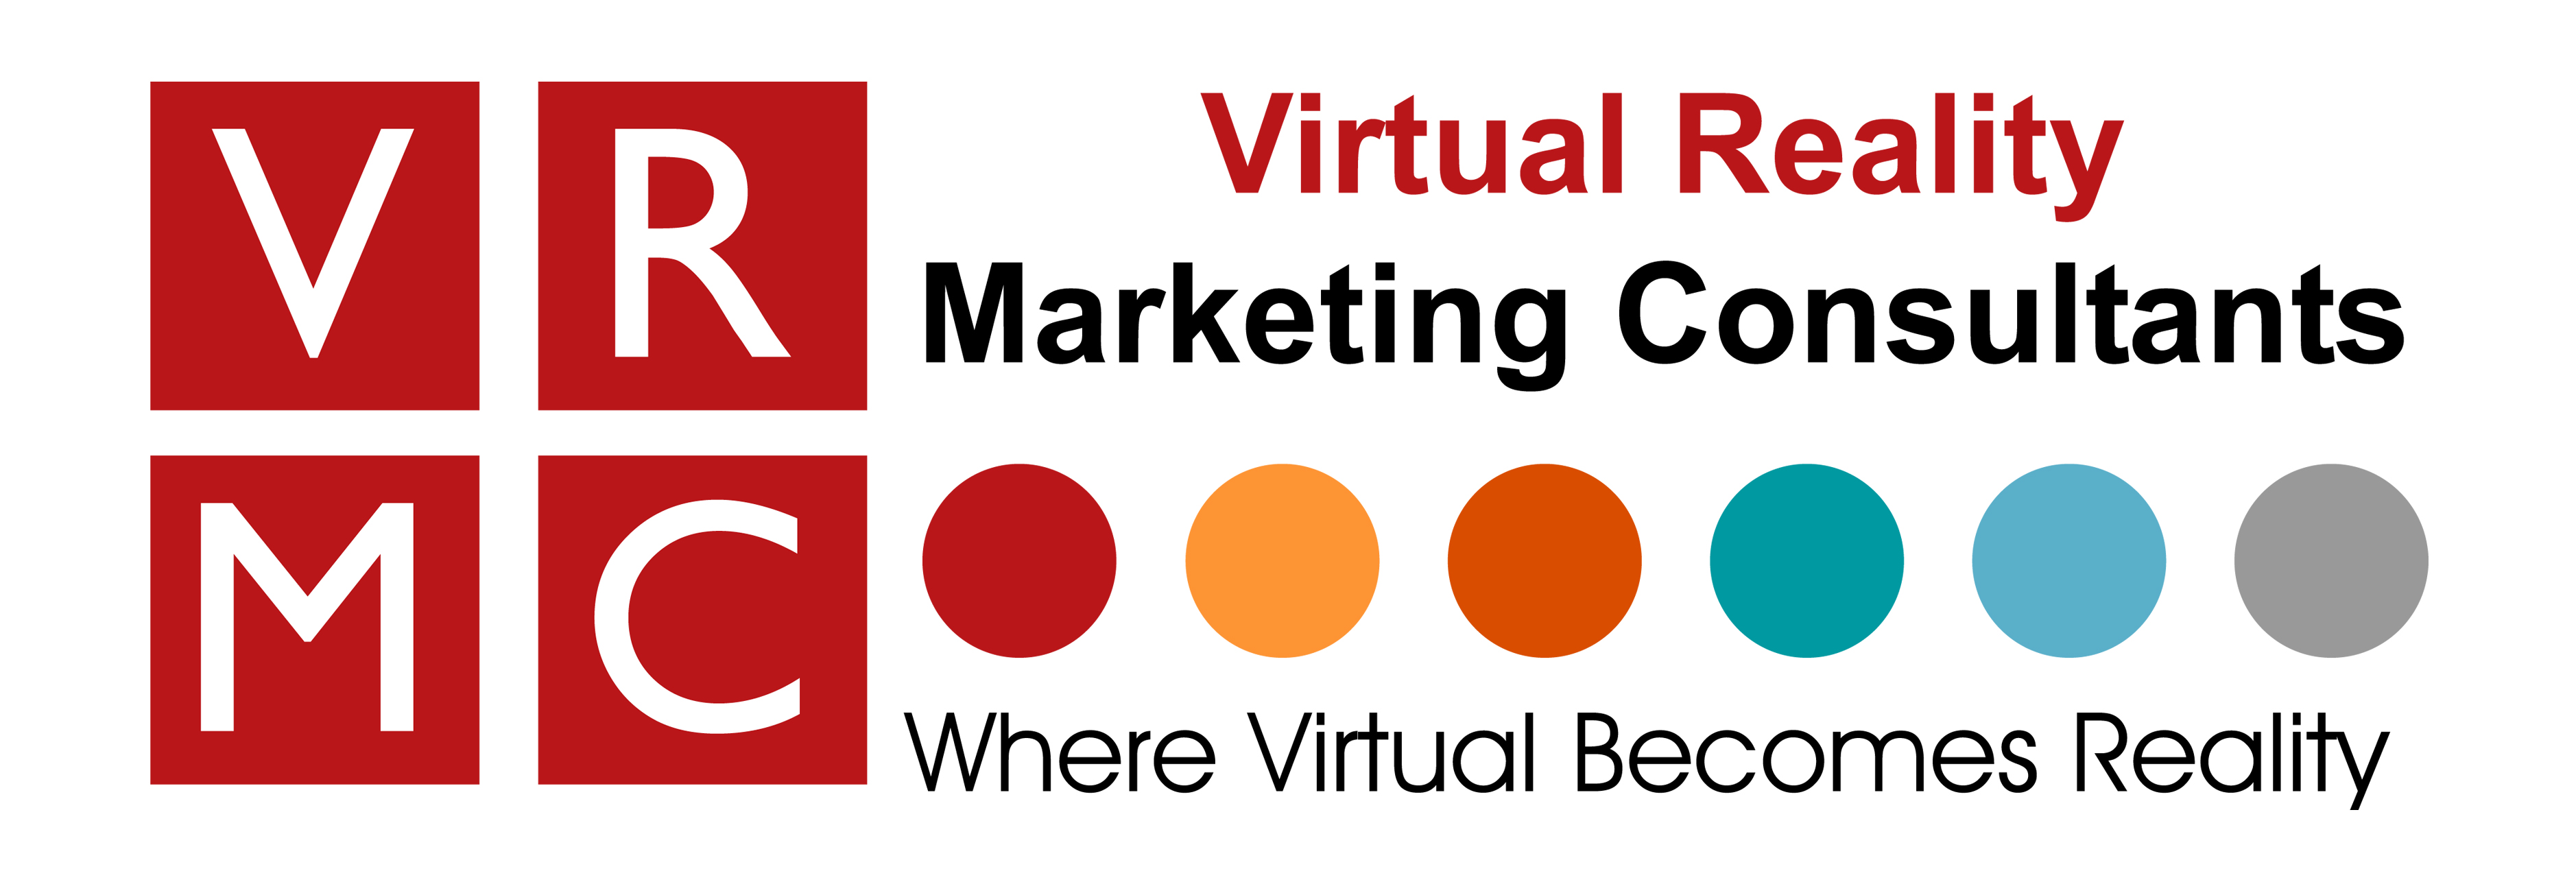 VRMC-logo